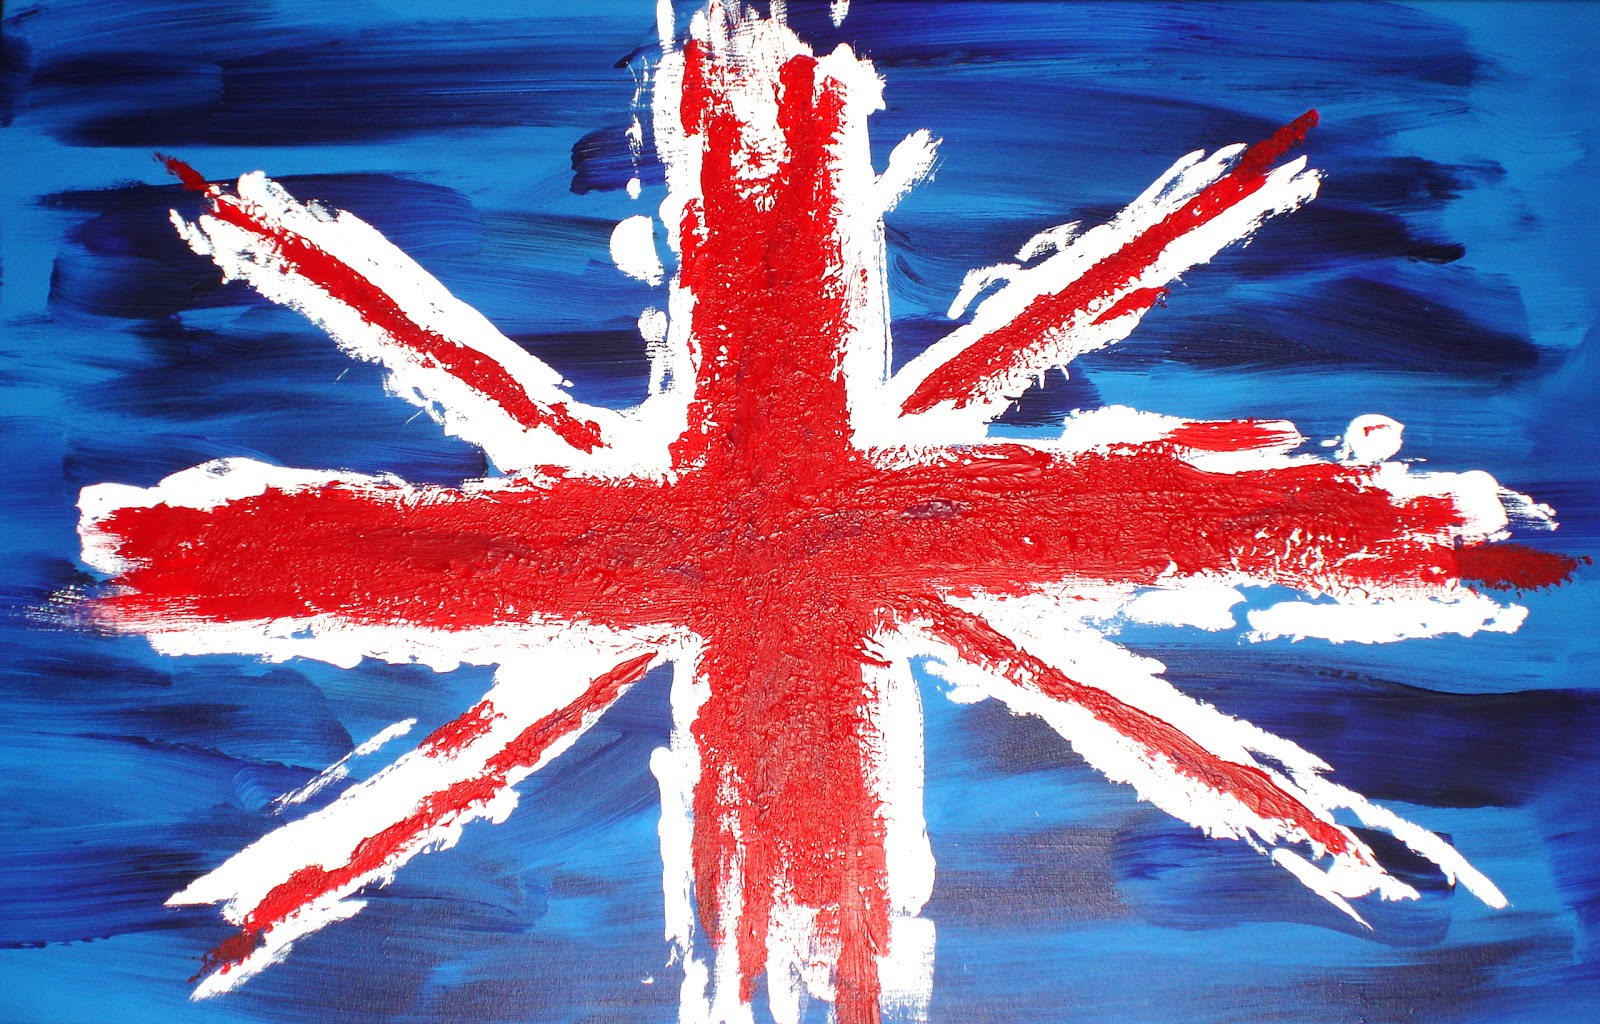 http://3.bp.blogspot.com/---5jaOh-rQI/UL8bELHhdsI/AAAAAAAABxQ/_uIP_tZfJ_U/s1600/british+flag+wallpaper.jpg